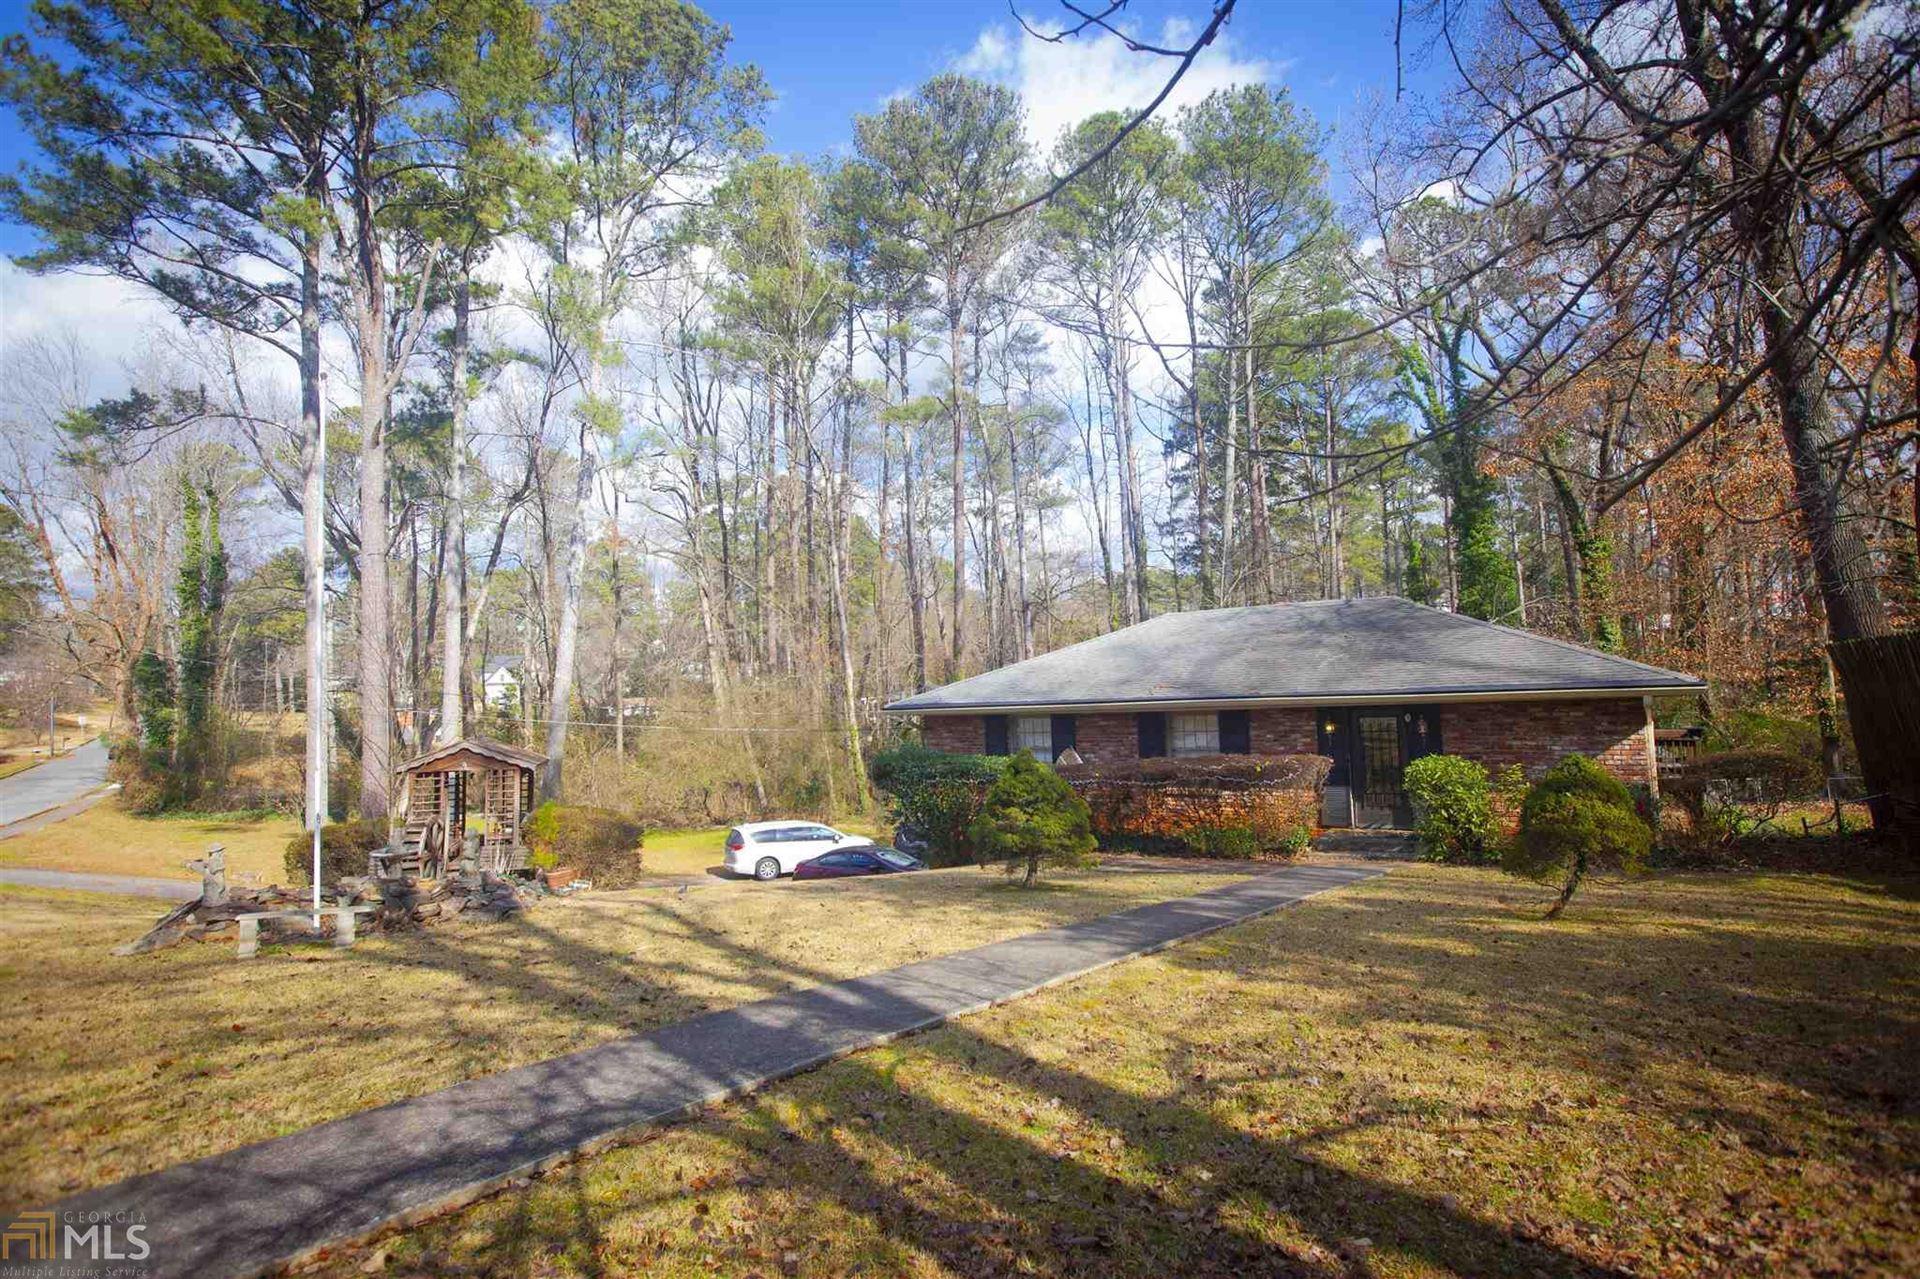 3491 Sexton Woods Dr, Atlanta, GA 30341 - MLS#: 8909098